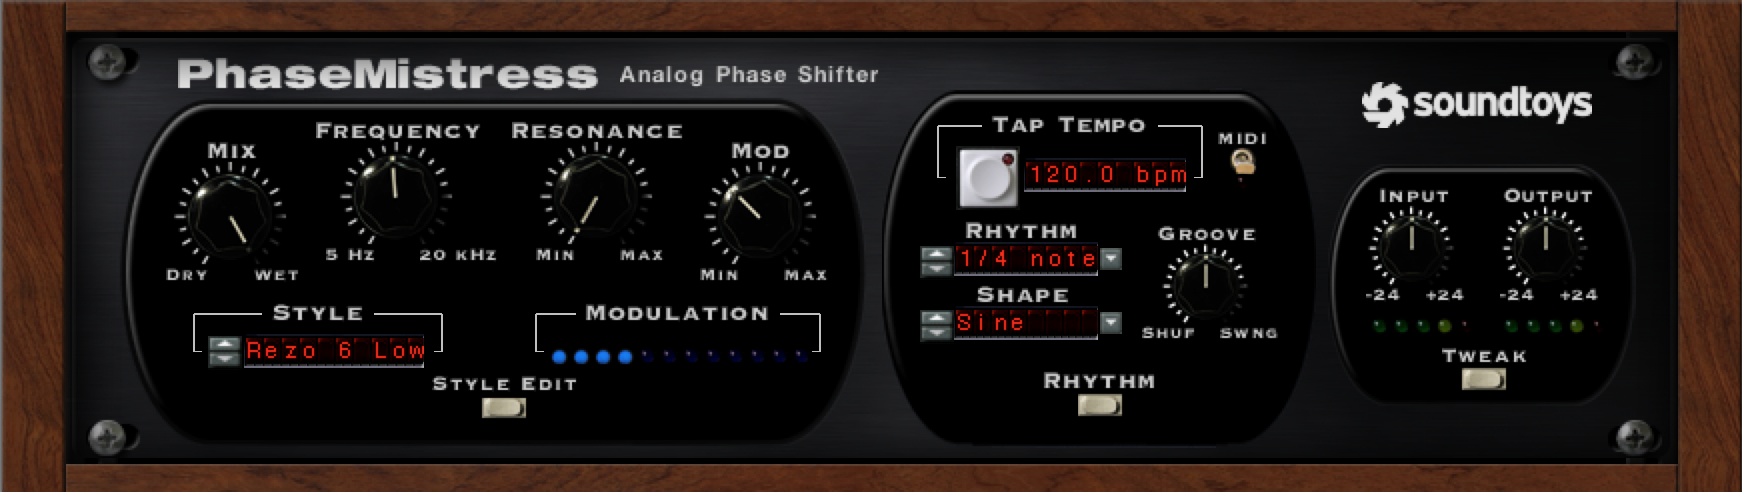 PhaseMistress - Soundtoys